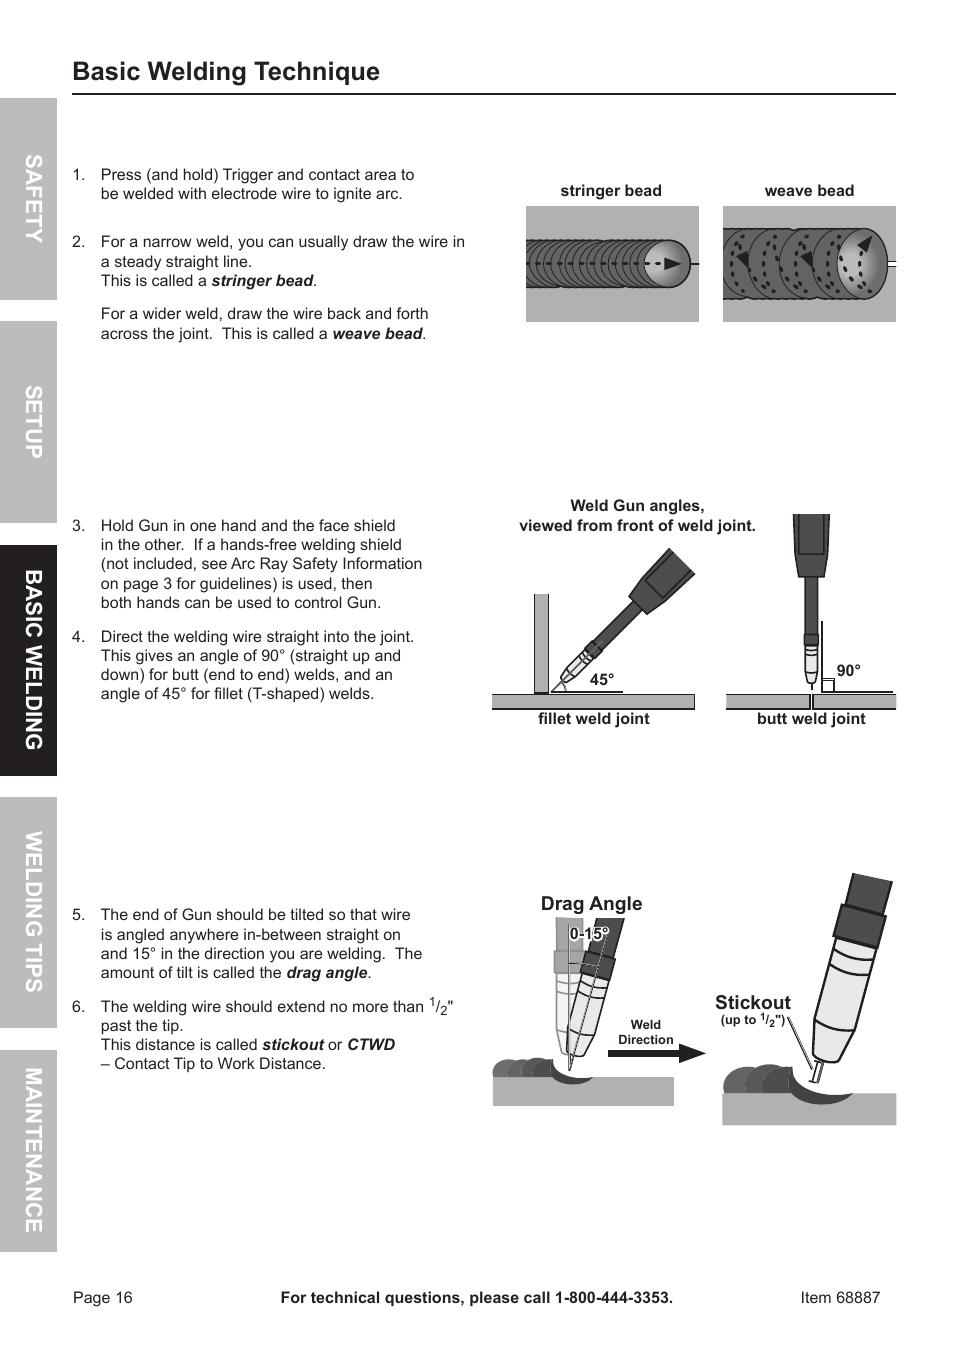 Basic welding technique | Chicago Electric 90 AMP FLUX WIRE WELDER ...